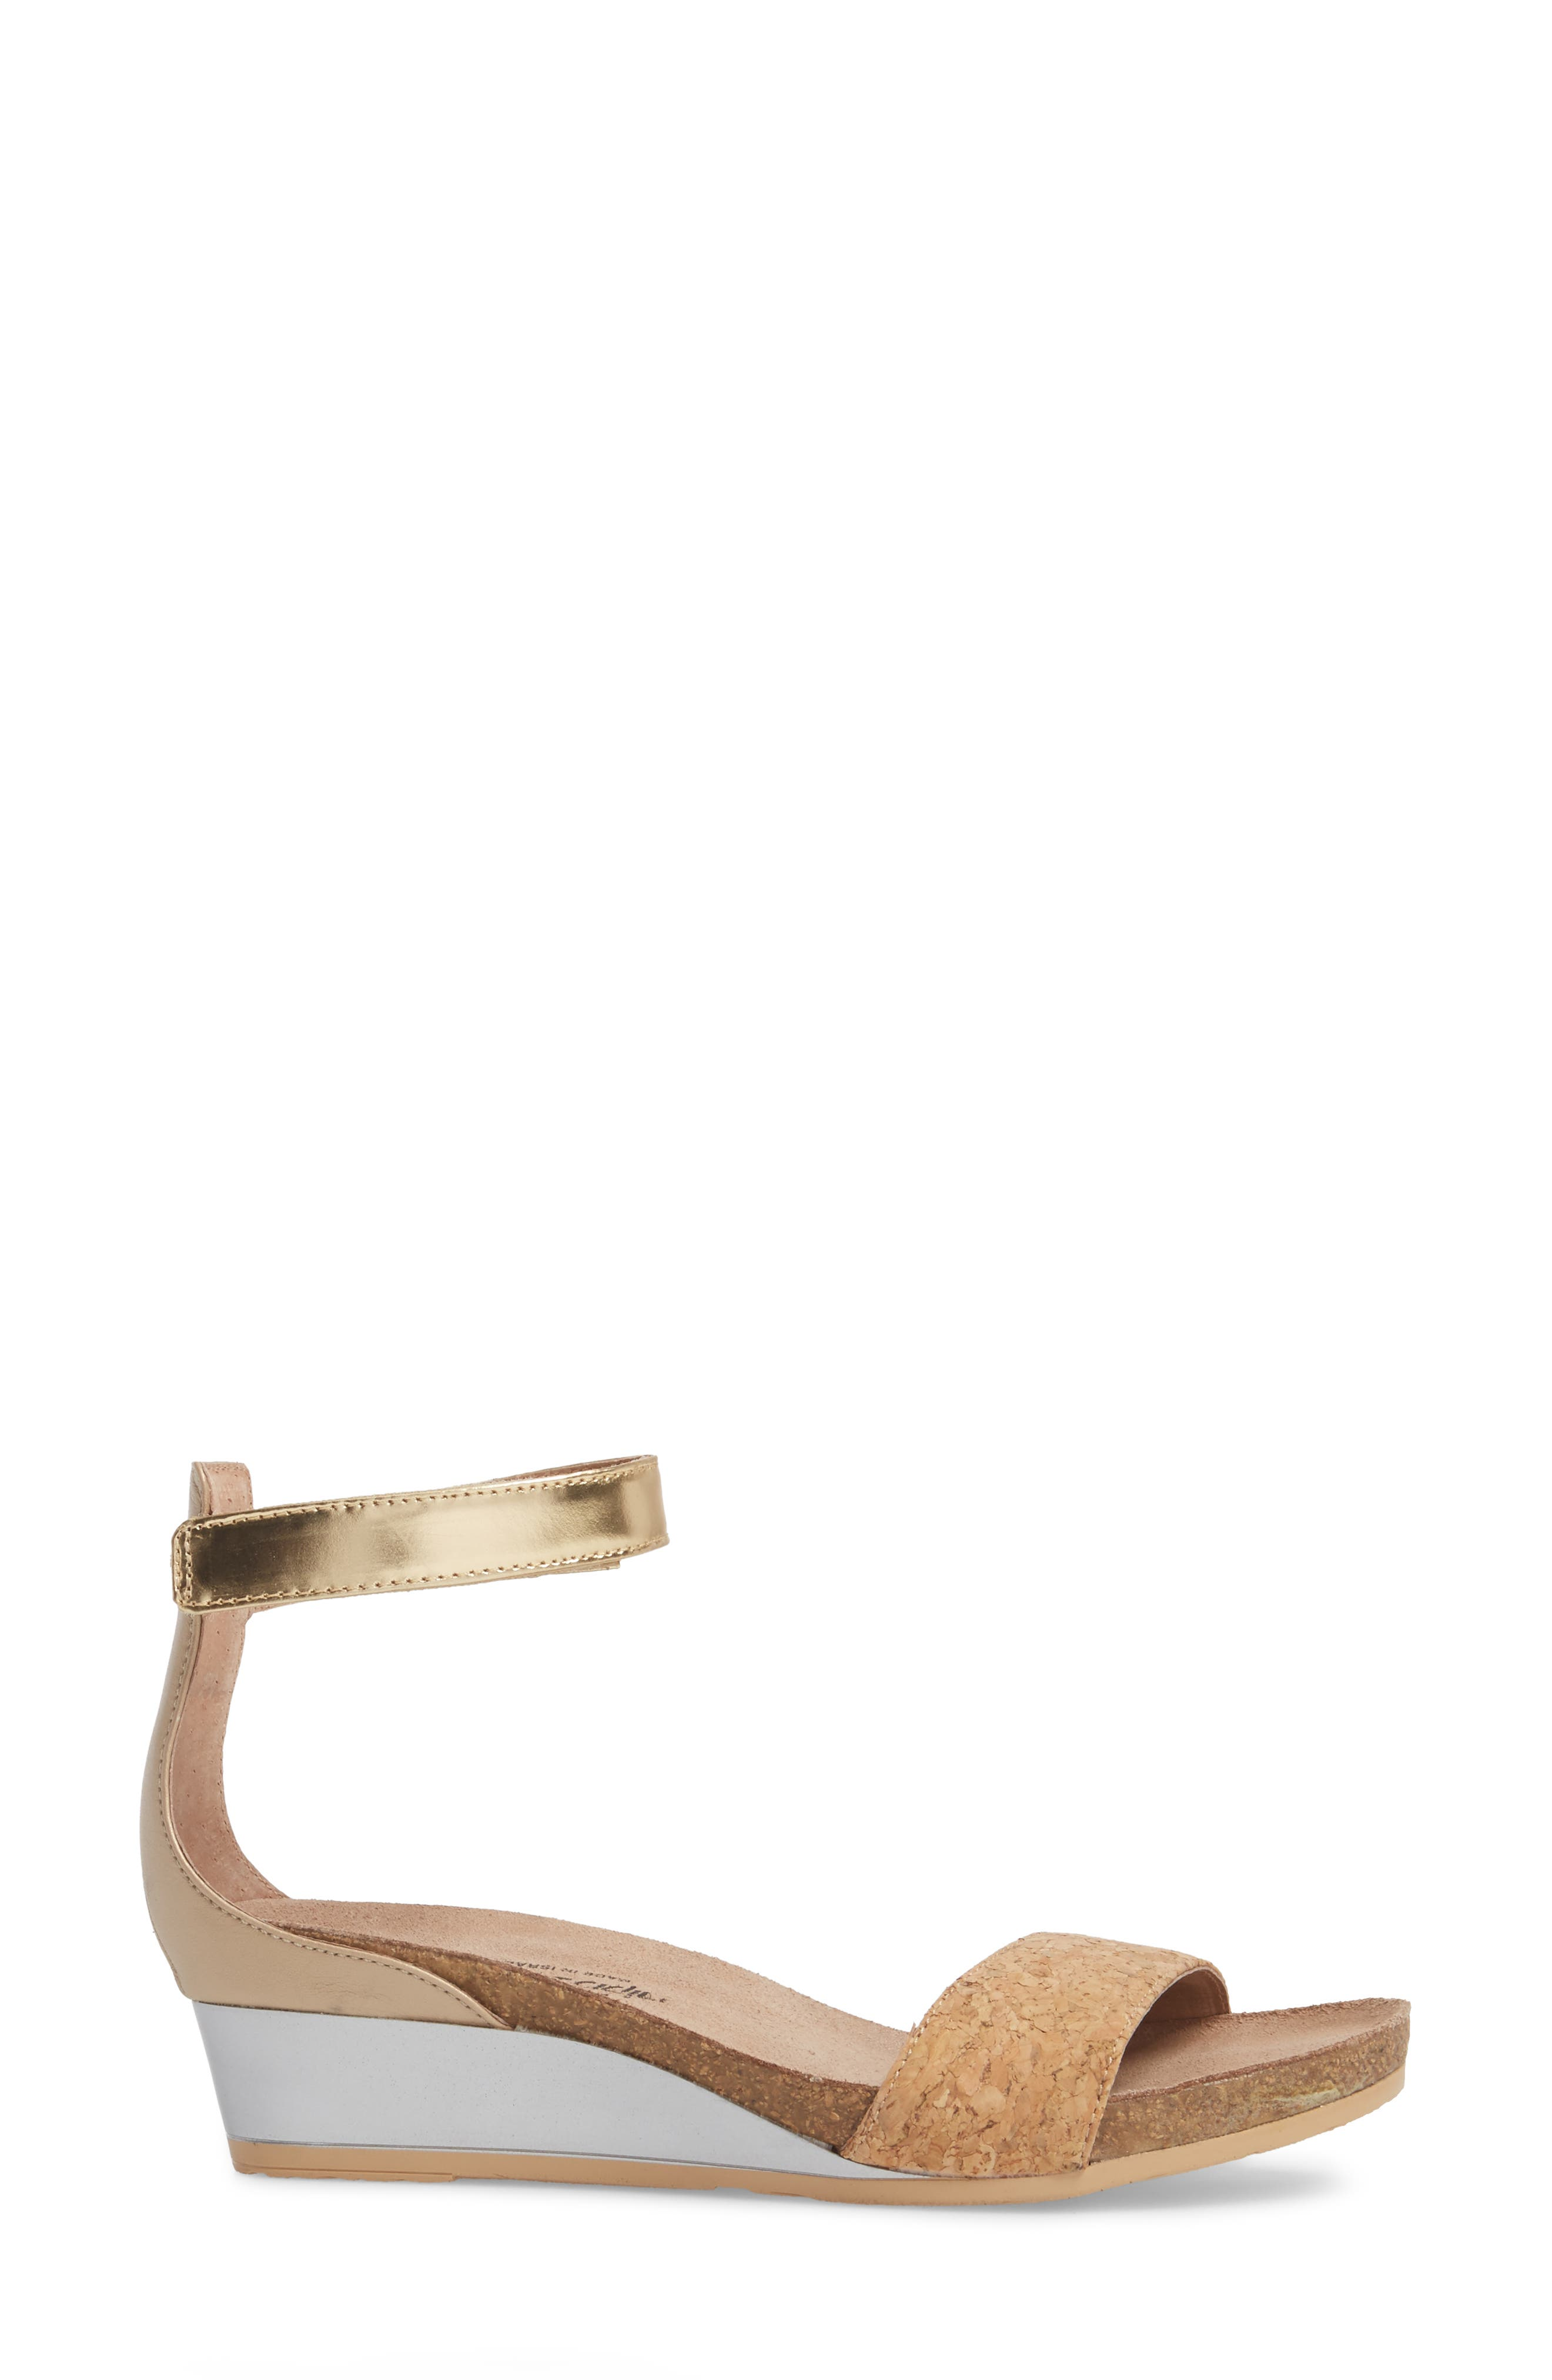 'Pixie' Sandal,                             Alternate thumbnail 2, color,                             Cork Leather